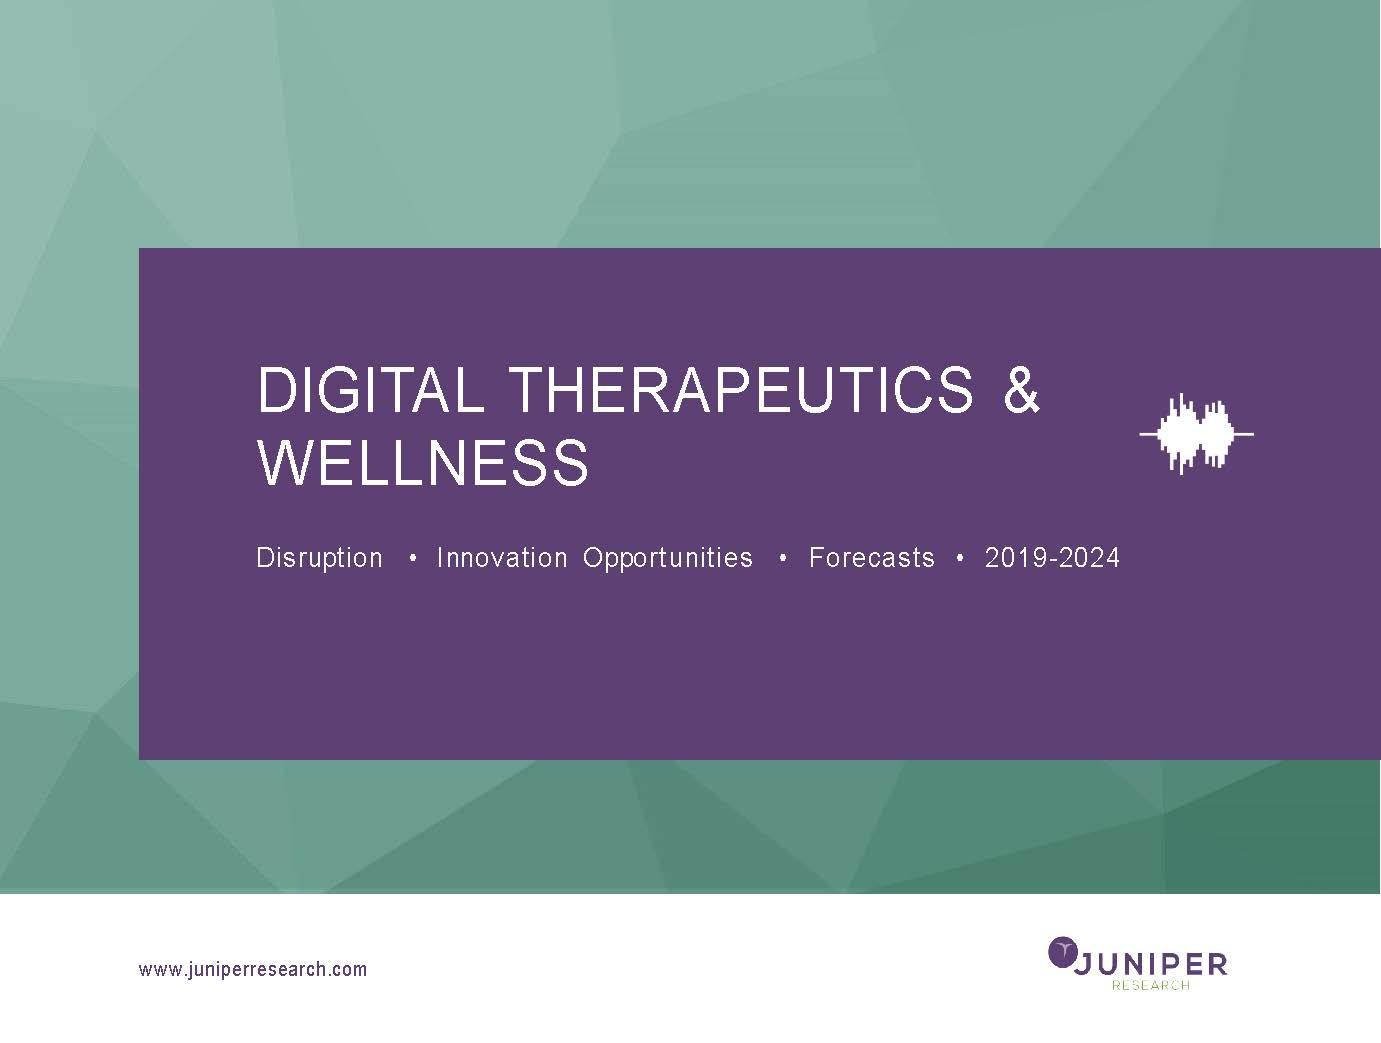 Digital Therapeutics & Wellness Research Report | Innovation